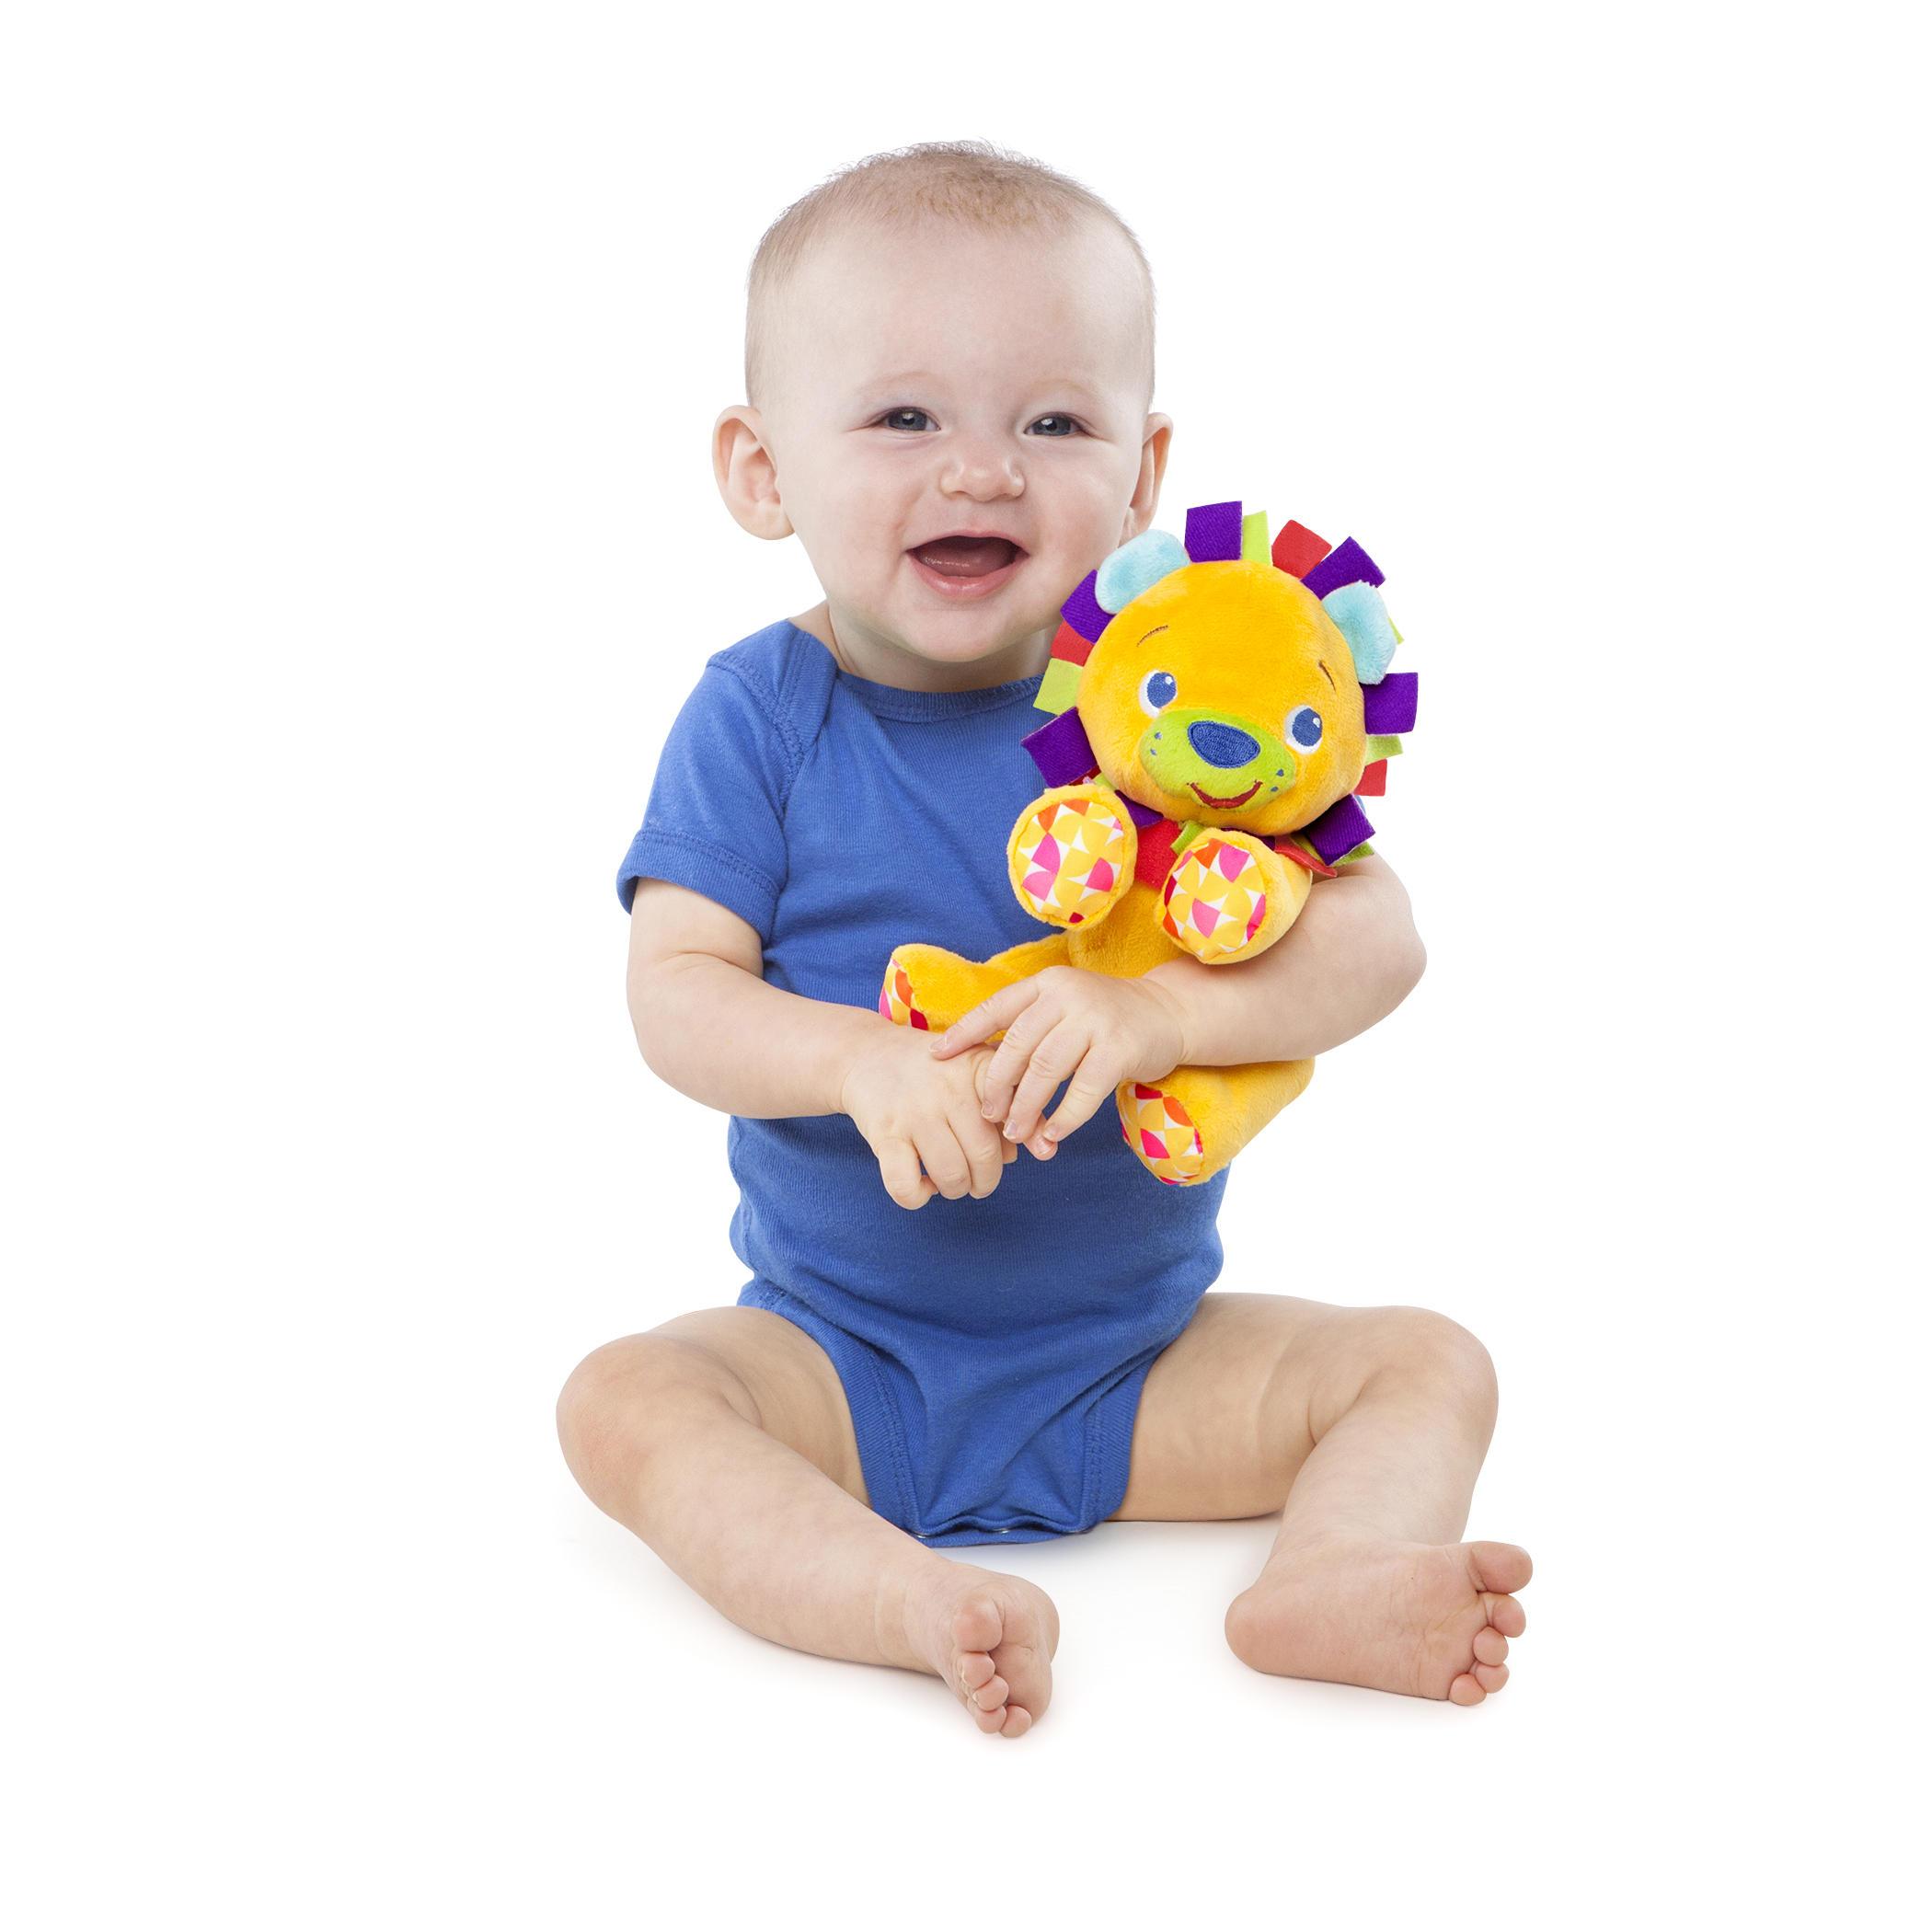 Snuggle 'n Shake Pal™ Plush Toy